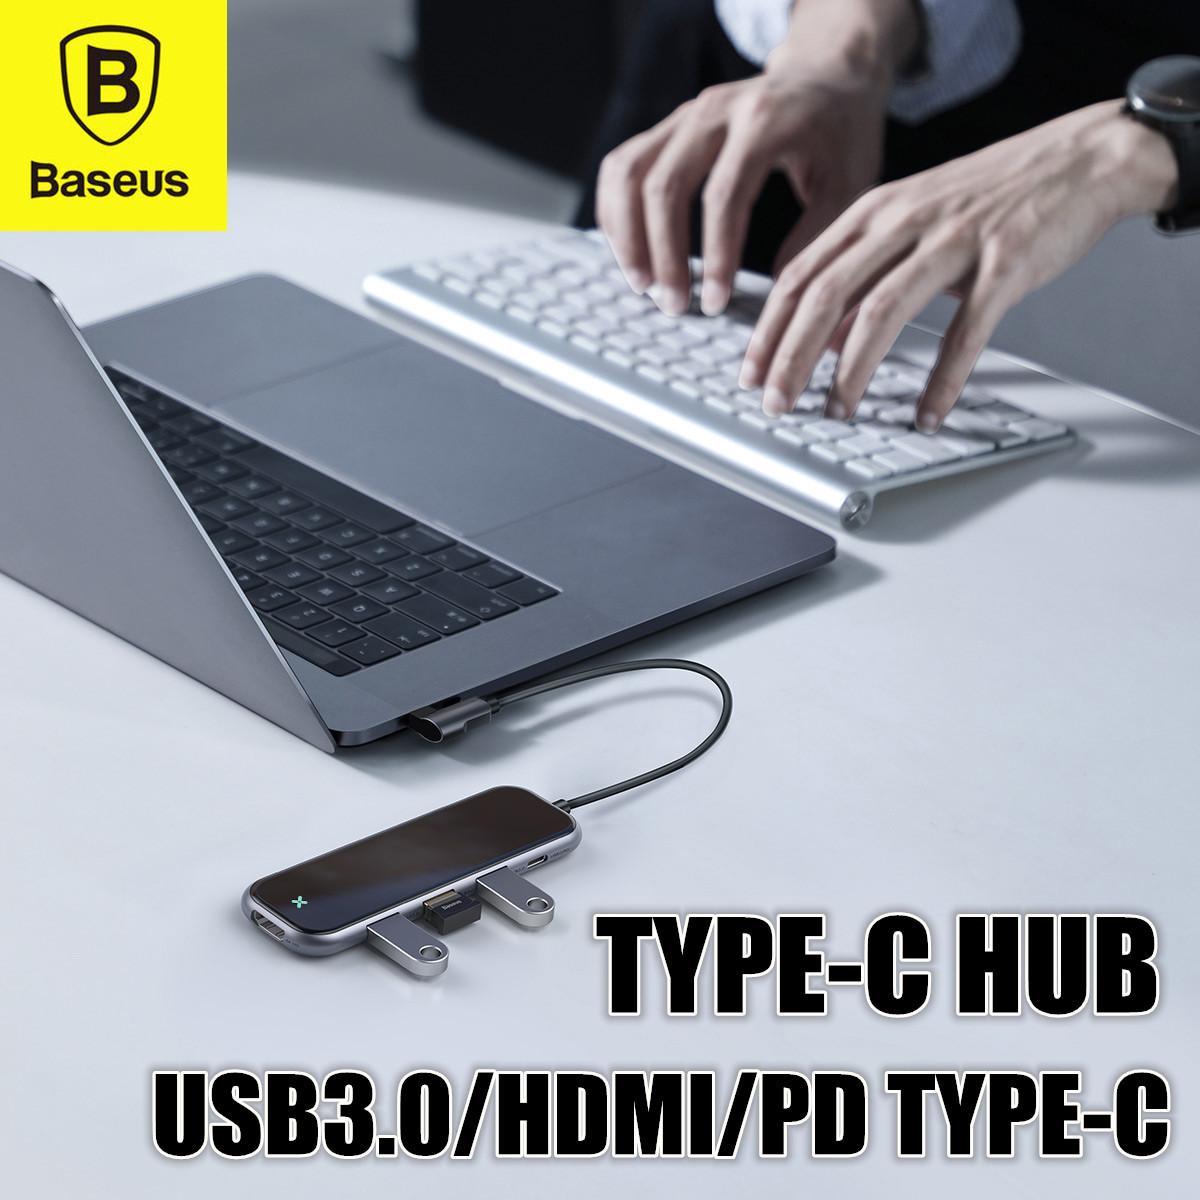 Baseus Mirror Type-C HUB Adapter Convertor (Type-C to 3 x USB3.0 + HDMI + PD Type-C)